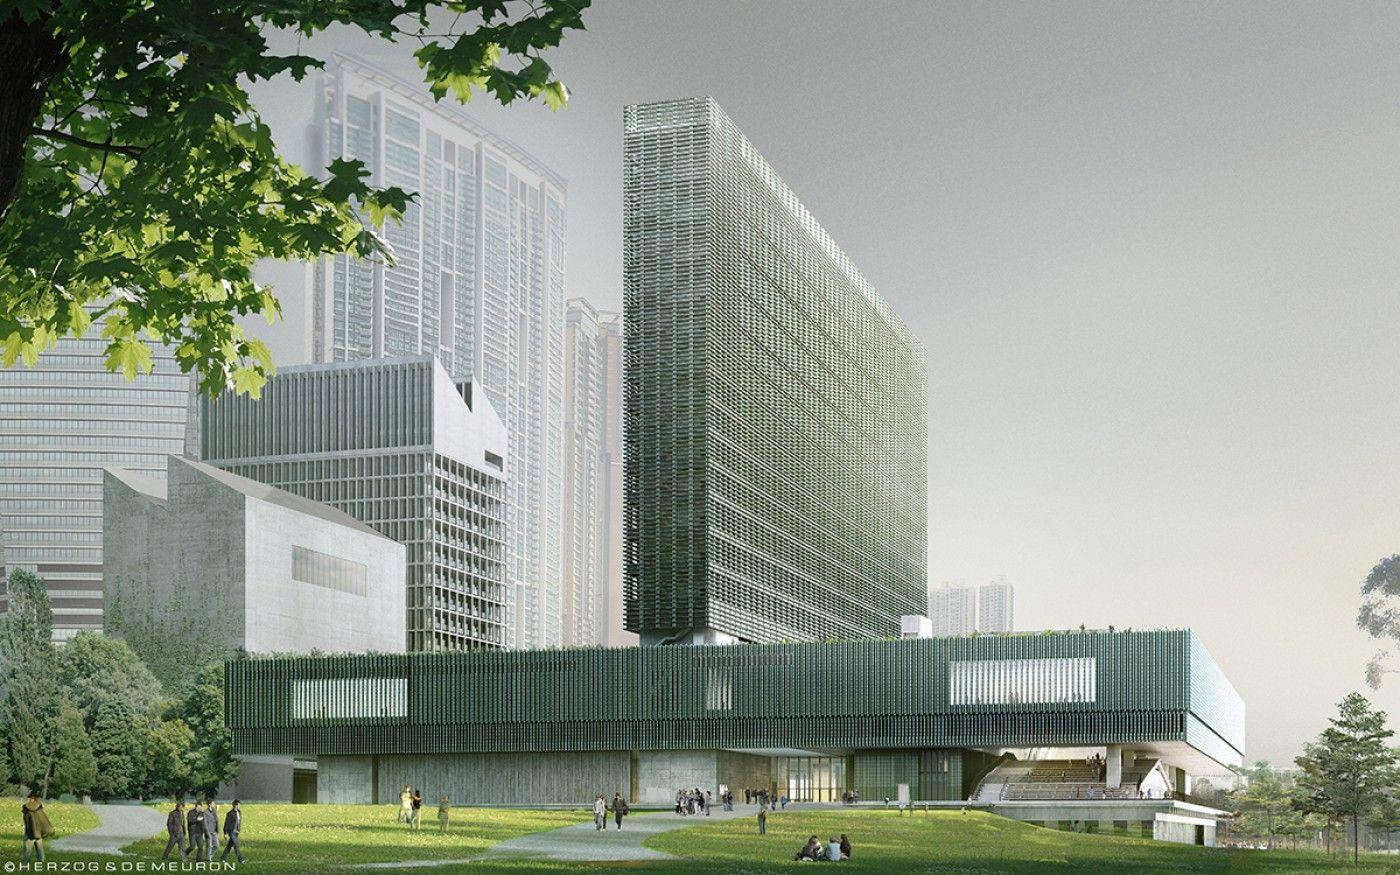 M +, Hong Kong, Herzog & de Meuron